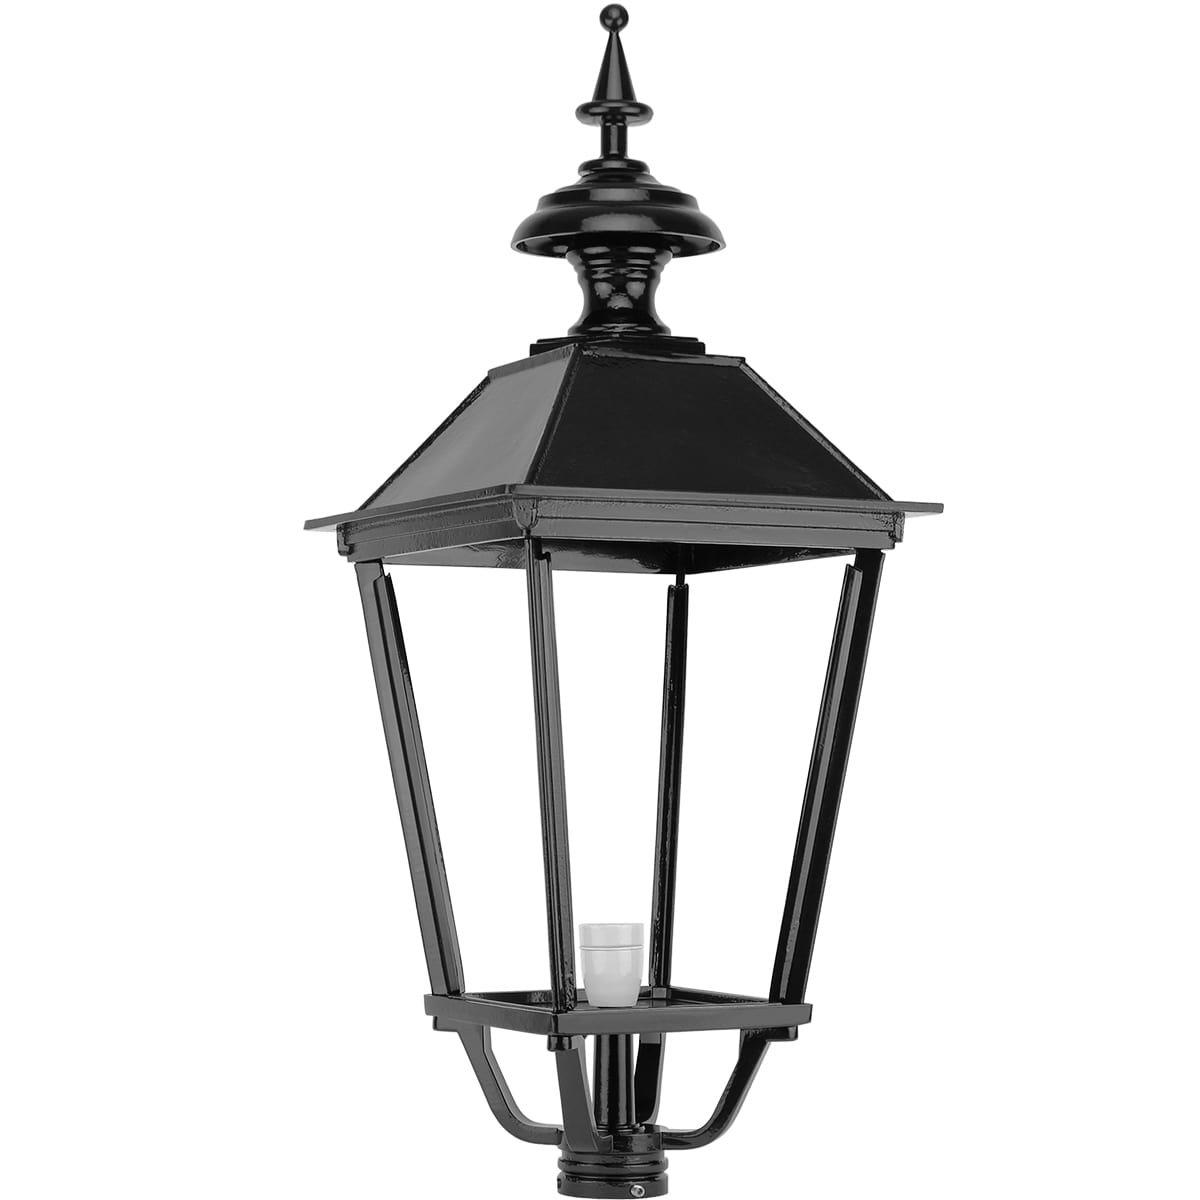 Outdoor lighting Classic Rural Loose lamp shade K02 - 75 cm